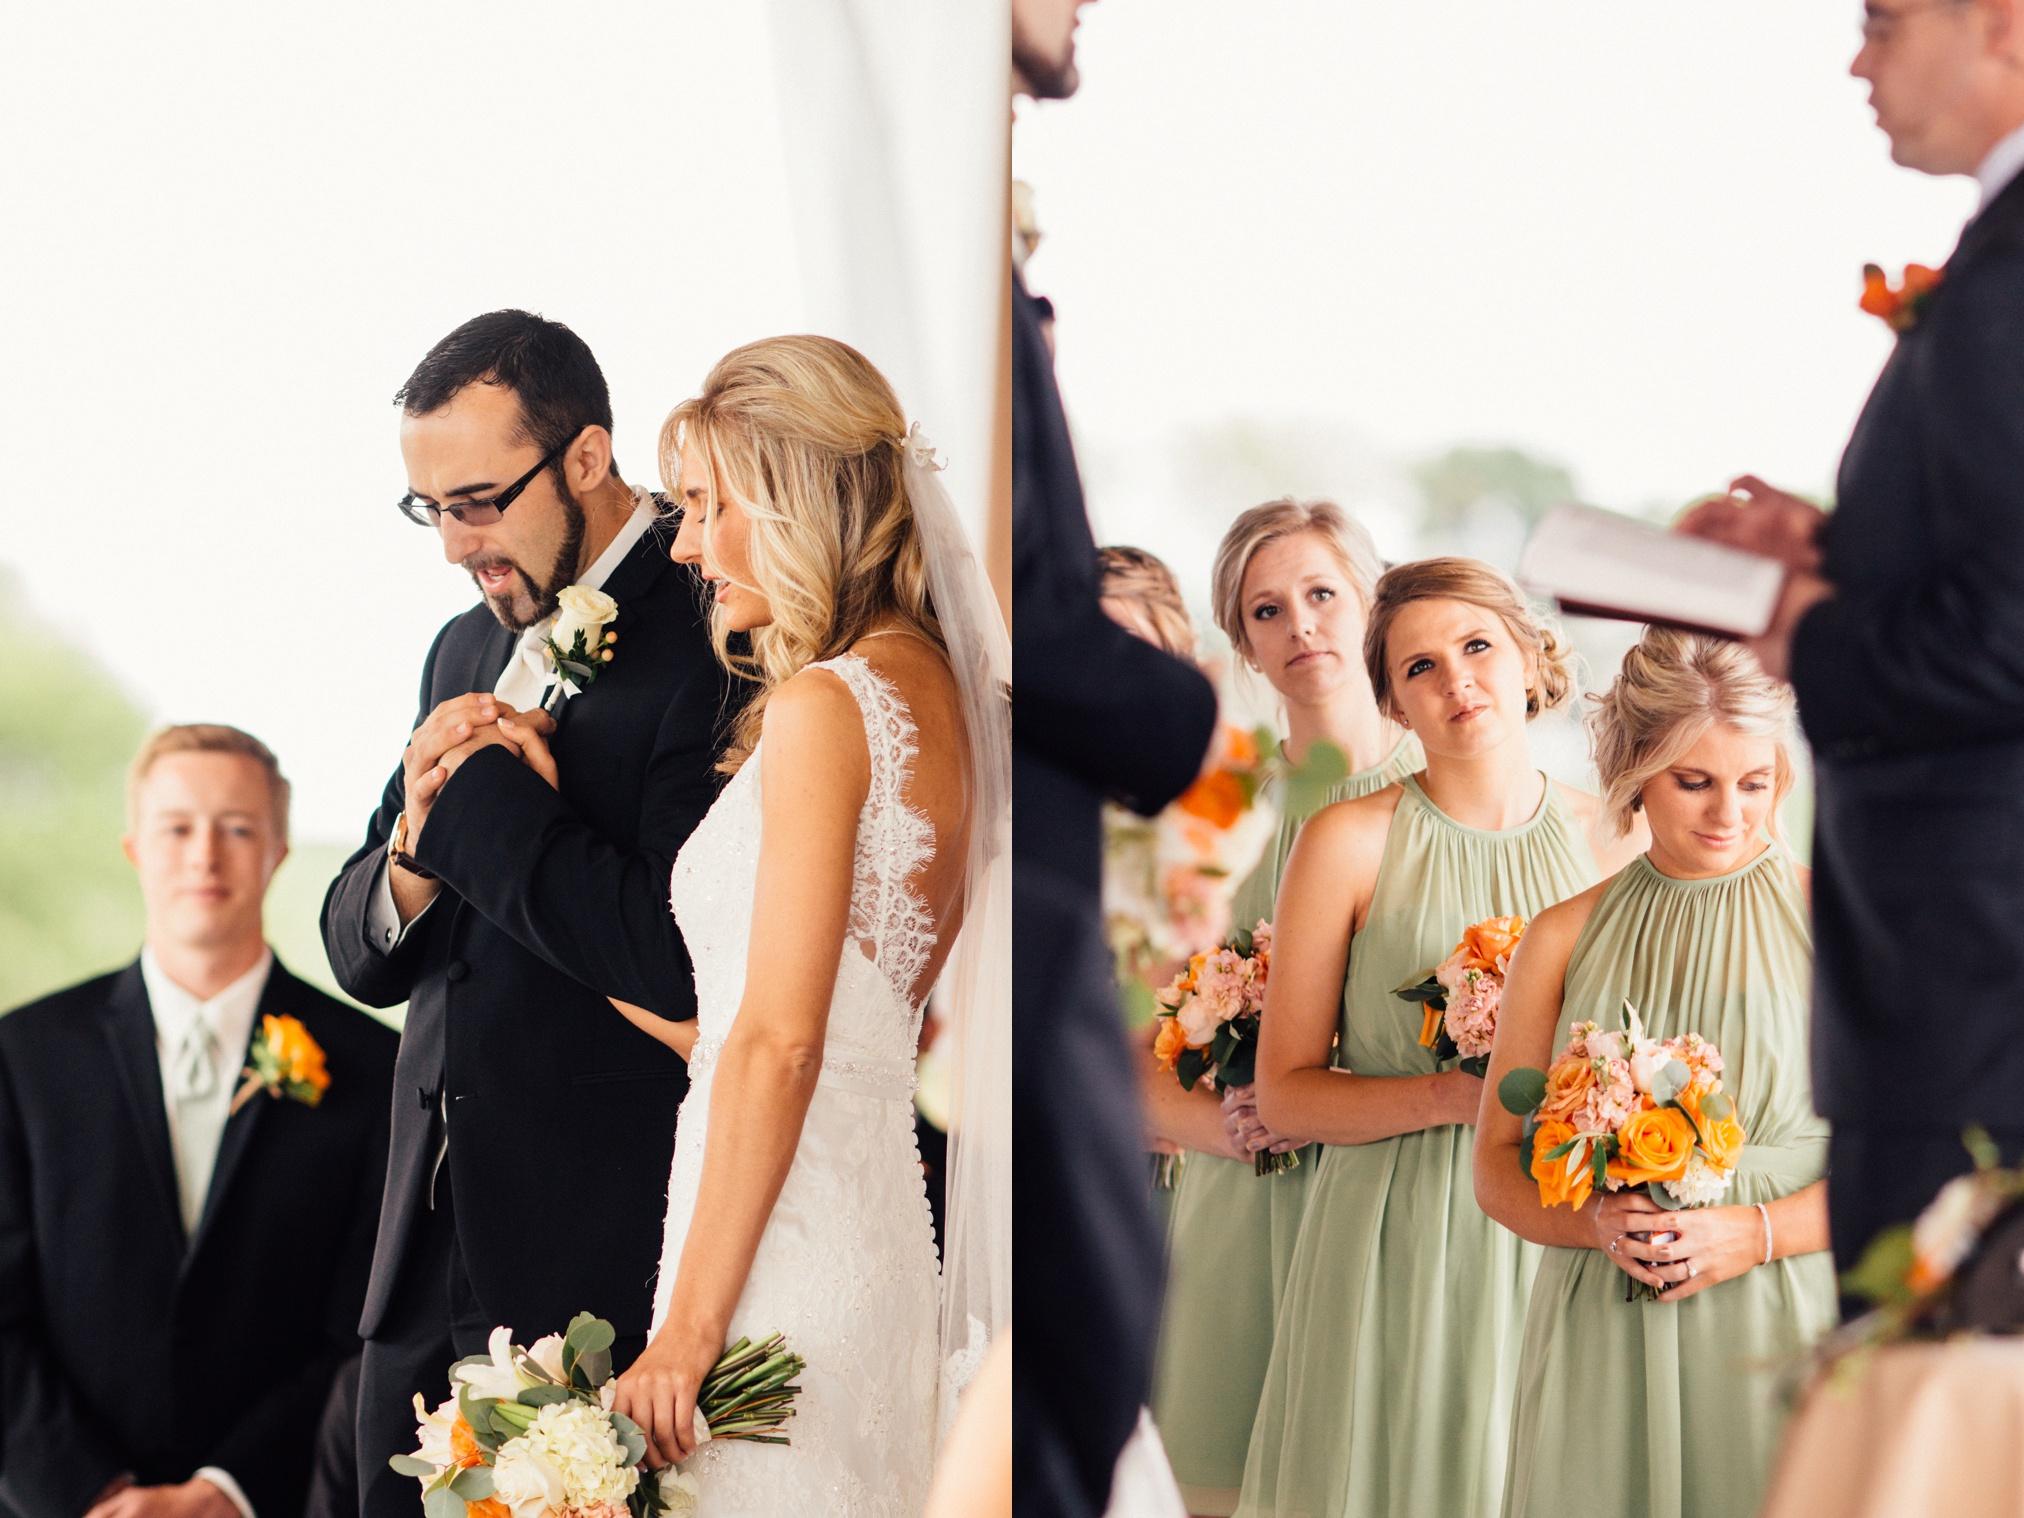 schmid_wedding-474.jpg